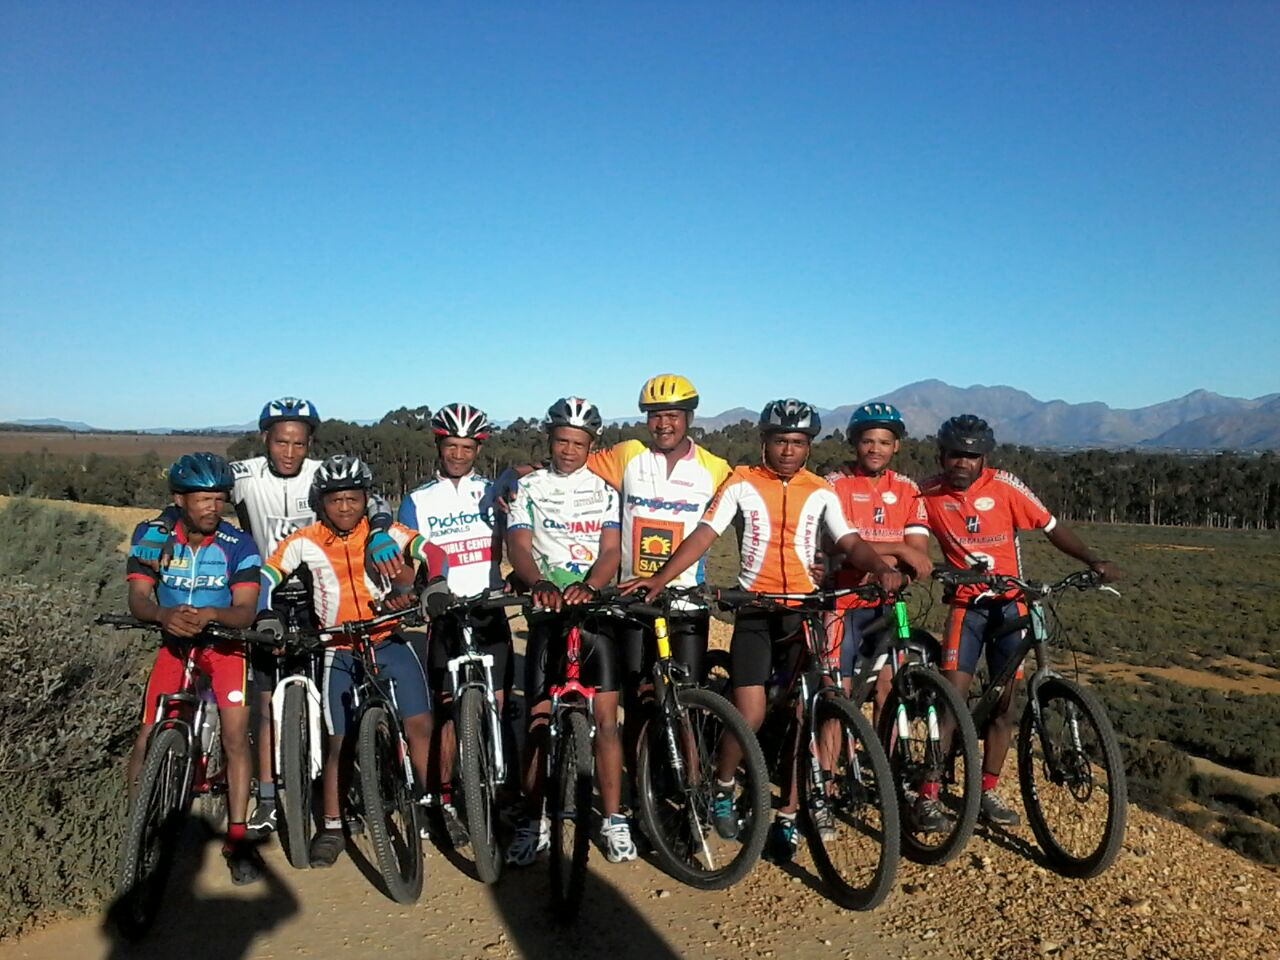 Gravel & Grape trail builders after a cycle. From left: Hannes Martiens; Gavin Vermeulen; Justin Brand; Isak Vermeulen; Doela Vermeulen; Danfred Lukas; Jerome Cupido ; Kotie Vermeulen and Johannes Brand